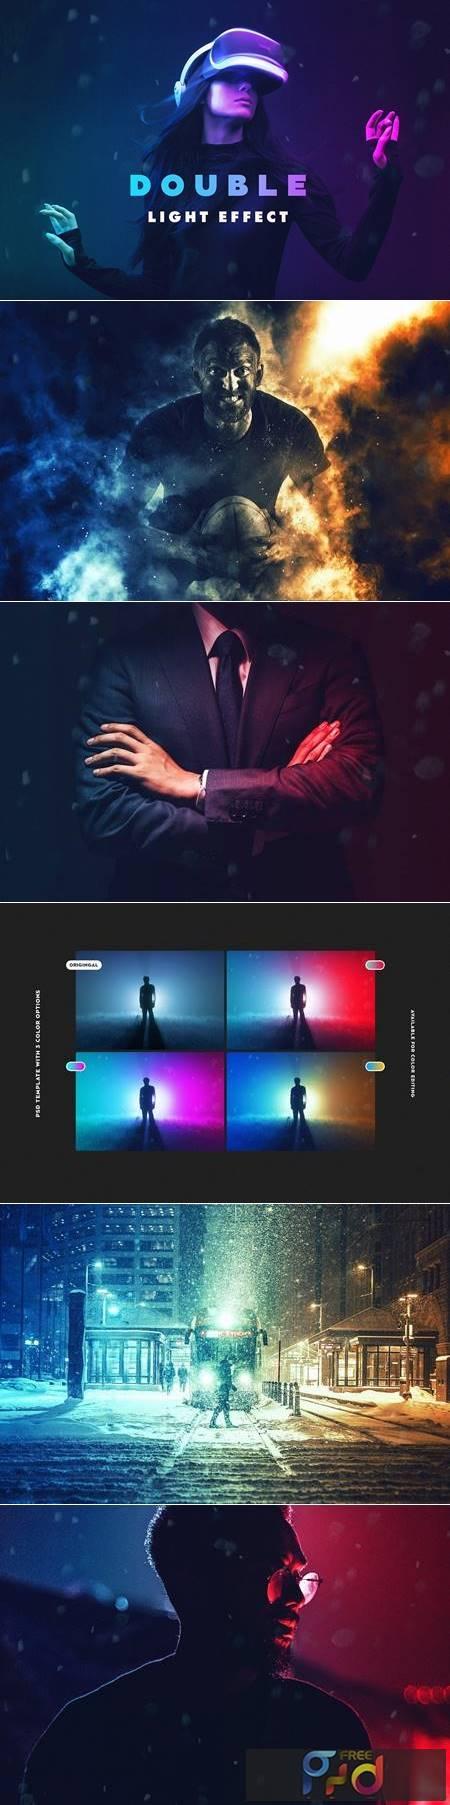 Double Light Photoshop Effect 4974274 1